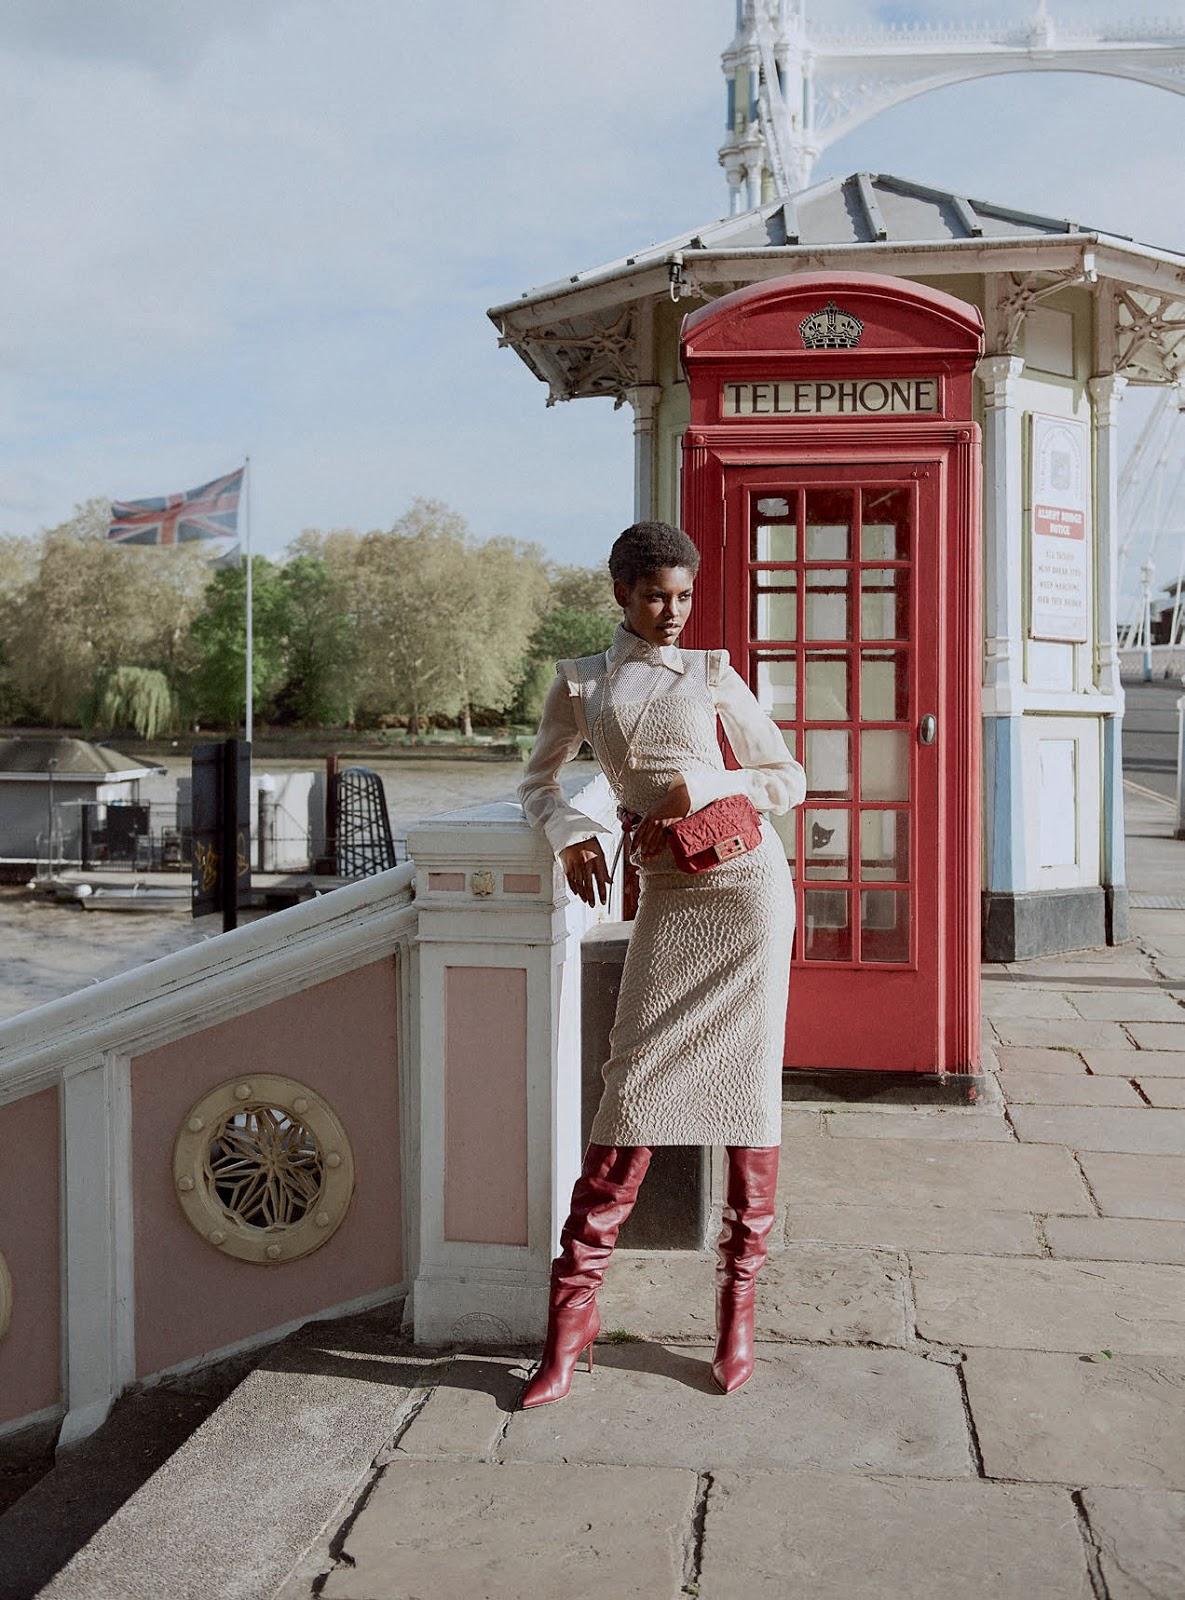 Amilna Estevao by Regan Cameron for Harper's Bazaar UK Sept 2019 (3).jpg